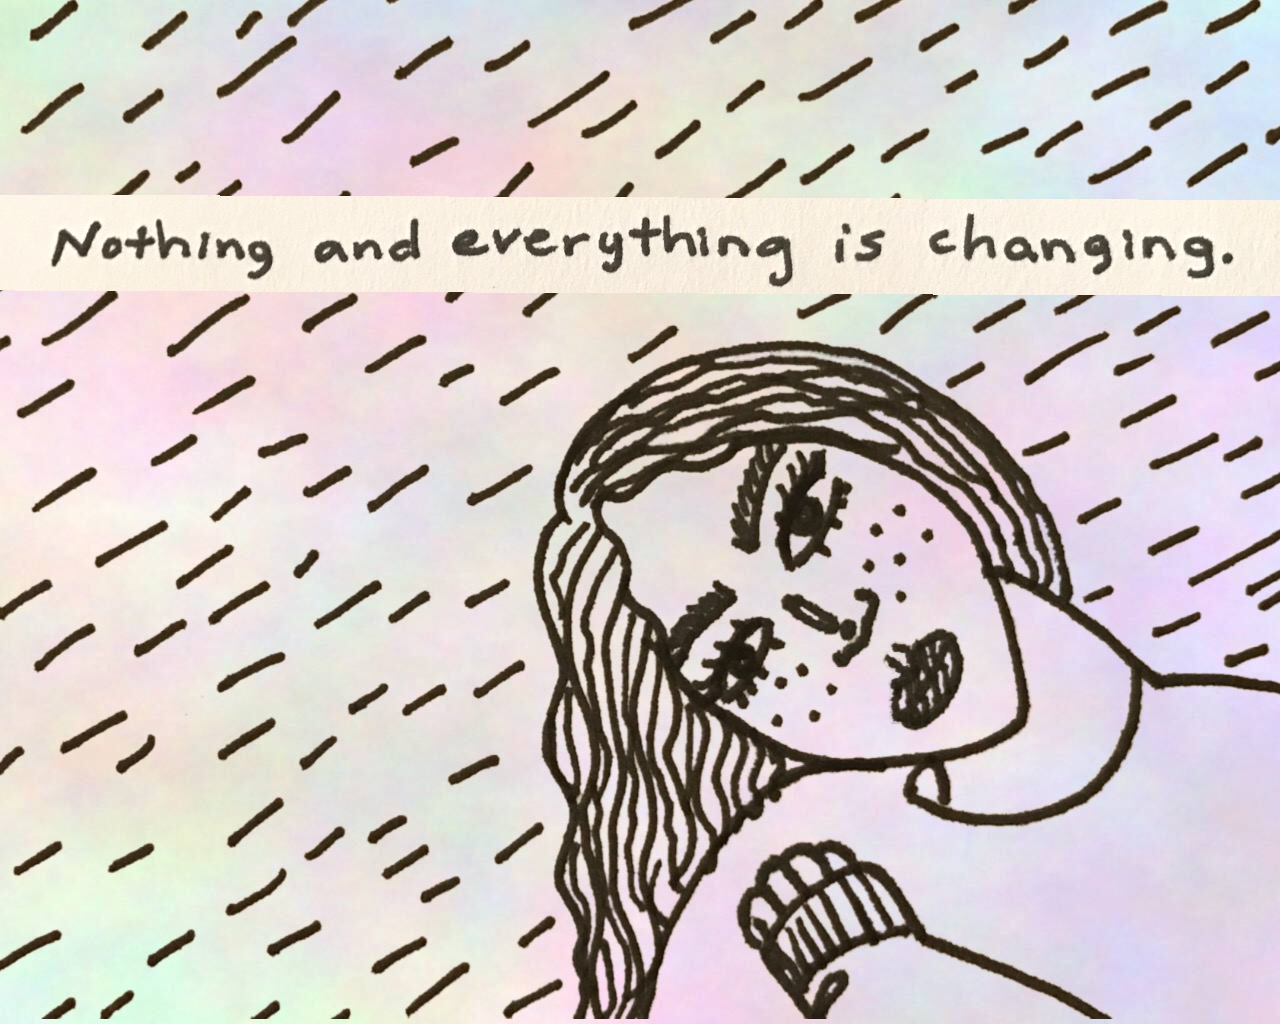 nothingeverything.JPG